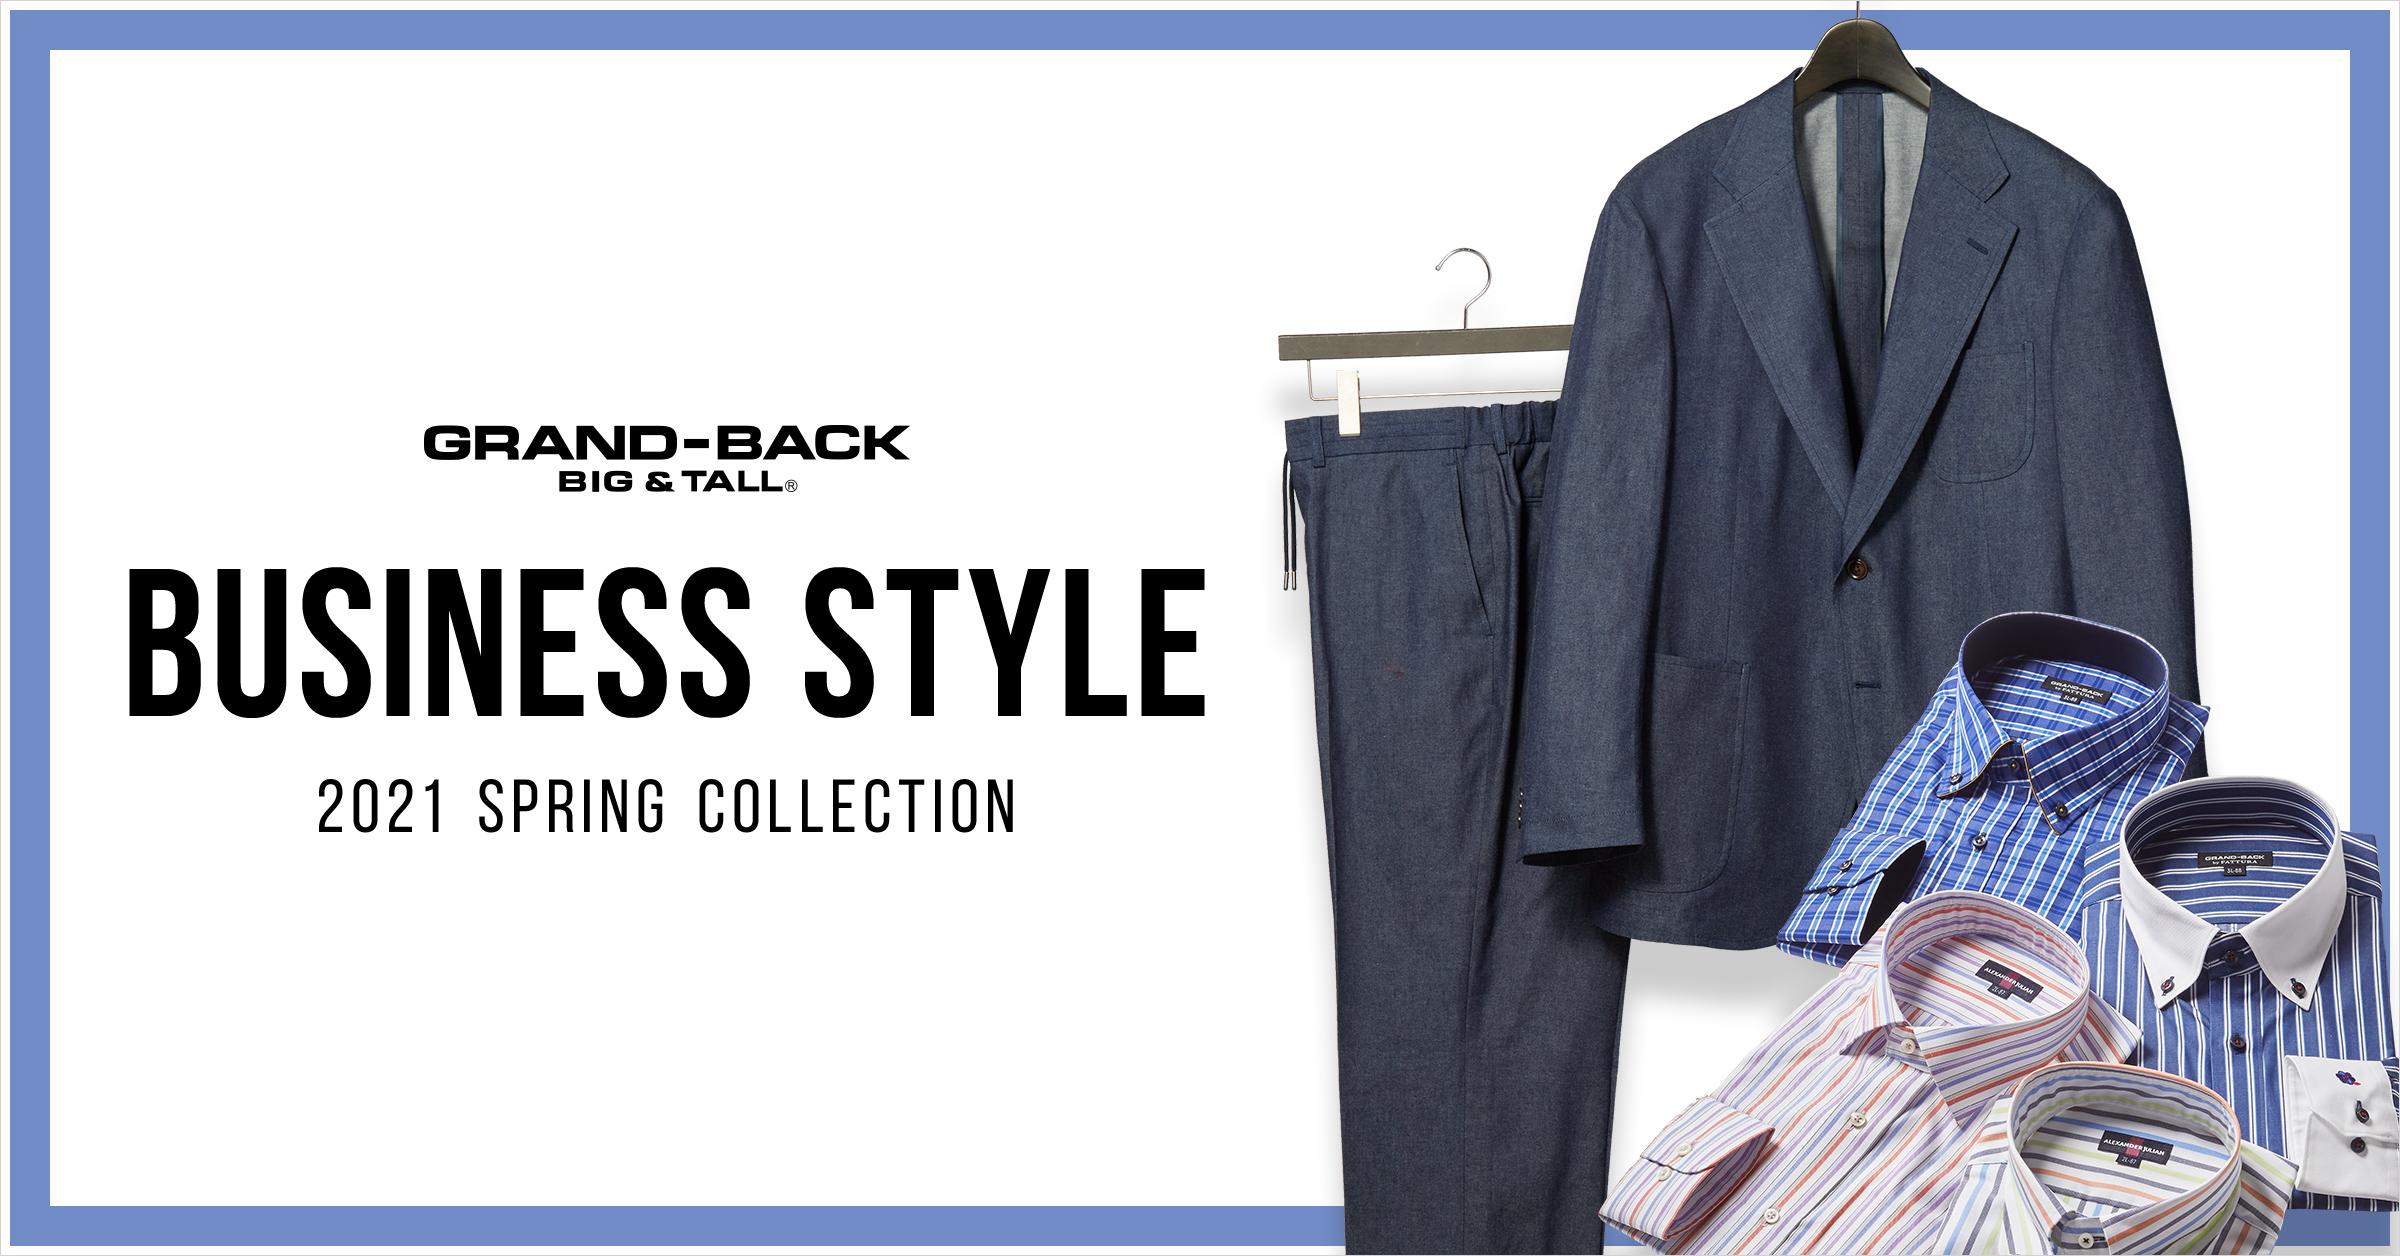 GRAND-BACK (グランバック) 2021 Spring Business style(2021 スプリング ビジネススタイル)